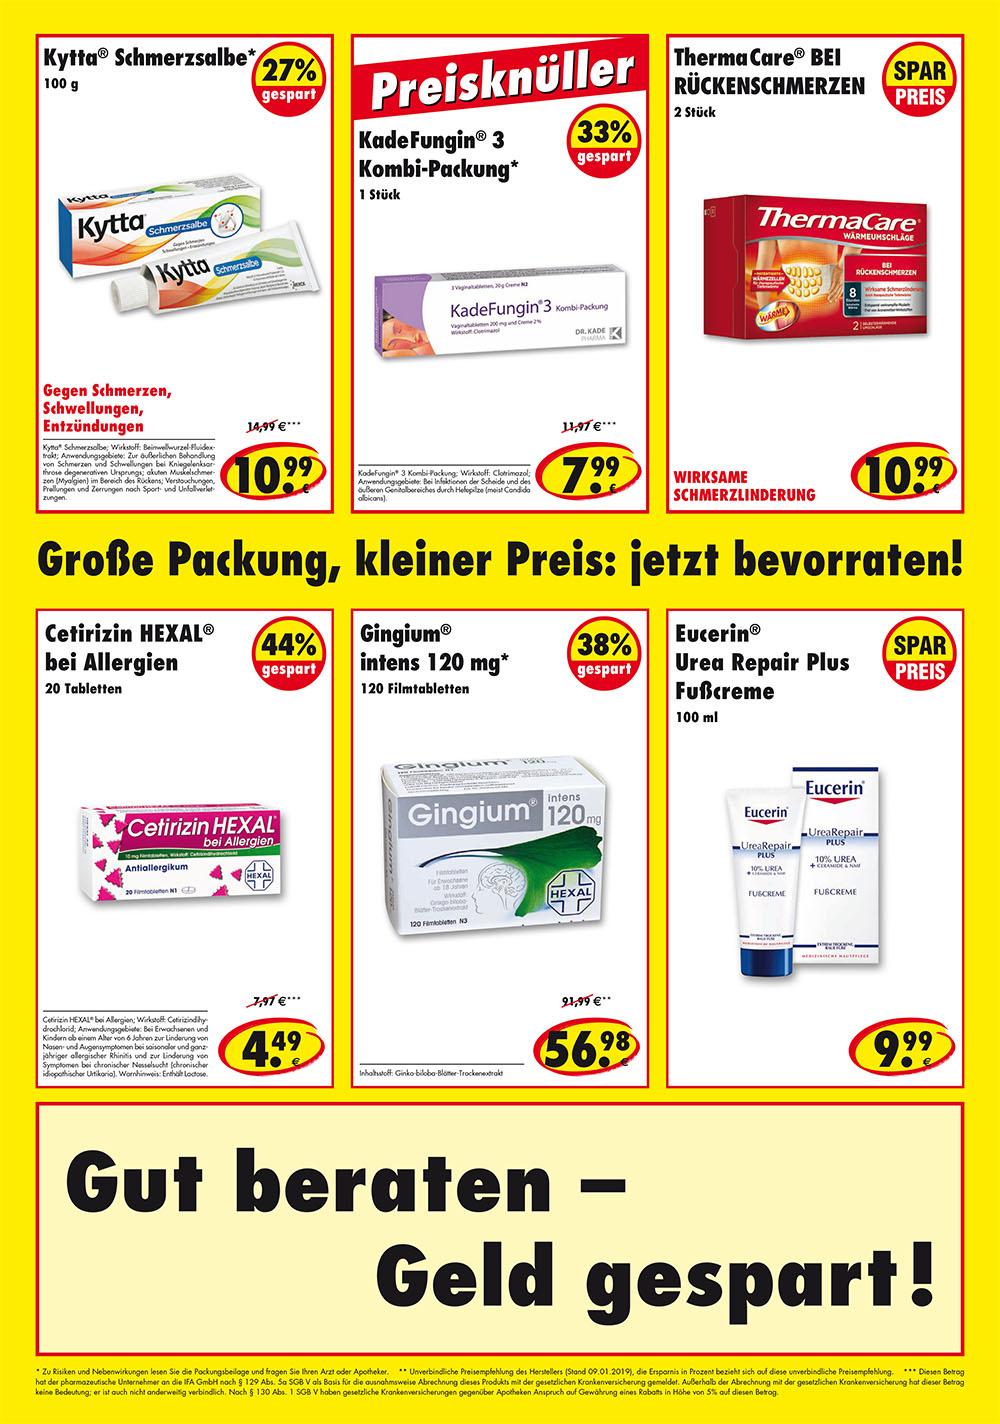 http://www.apotheken.de/fileadmin/clubarea/00000-Angebote/47447_13605_ahorn_angebot_4.jpg